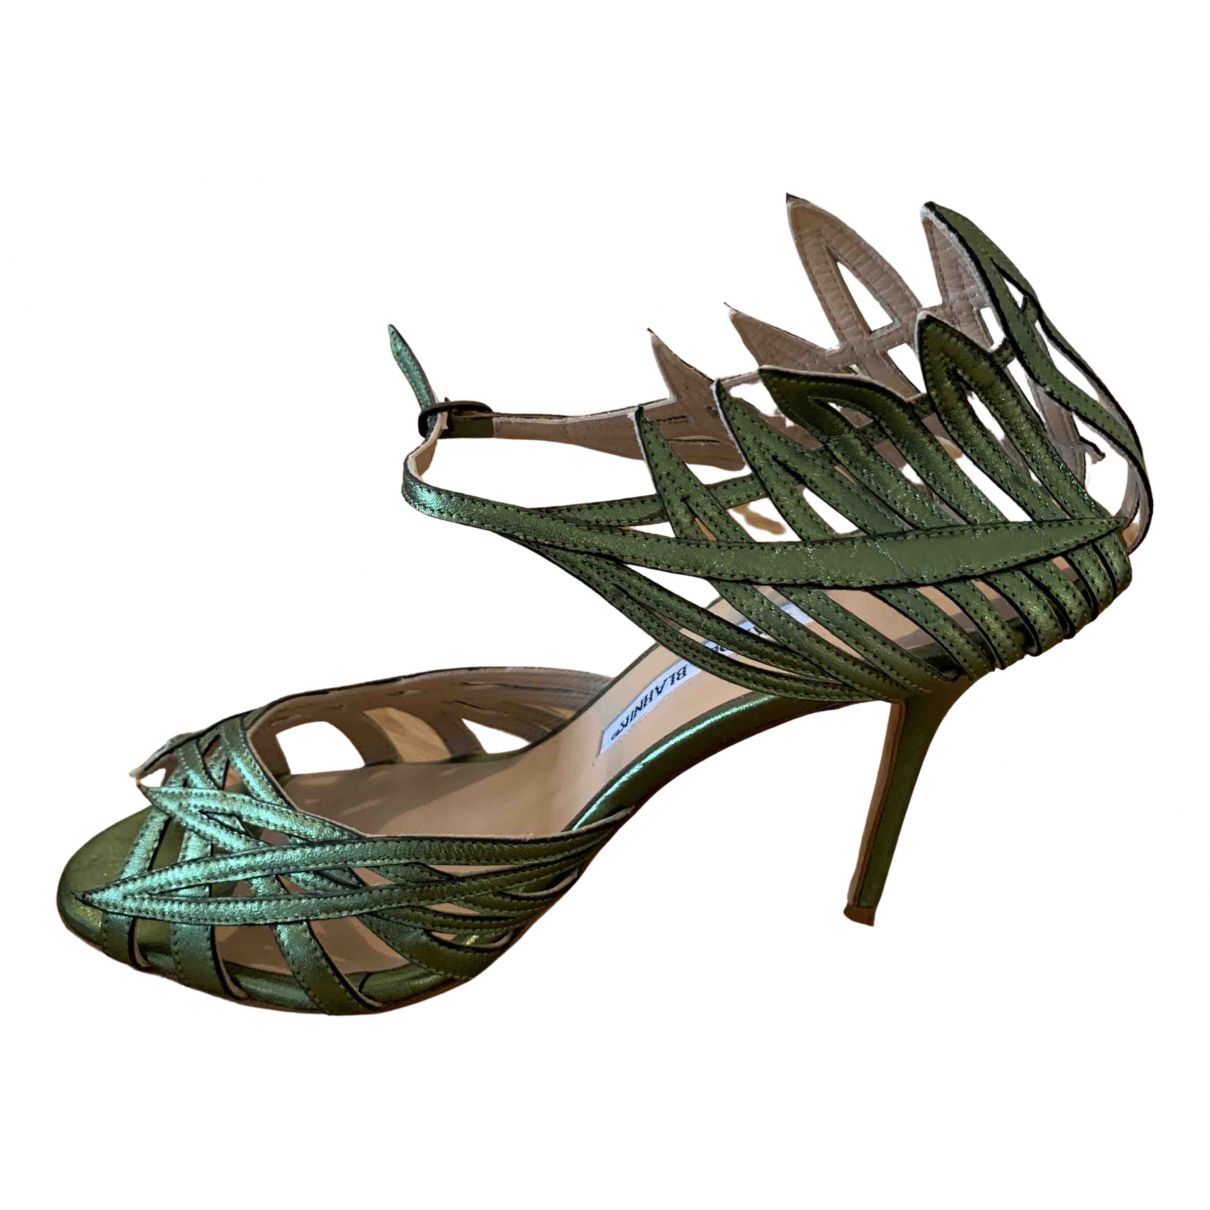 Manolo Blahnik N Green Leather Sandals for Women 40 EU